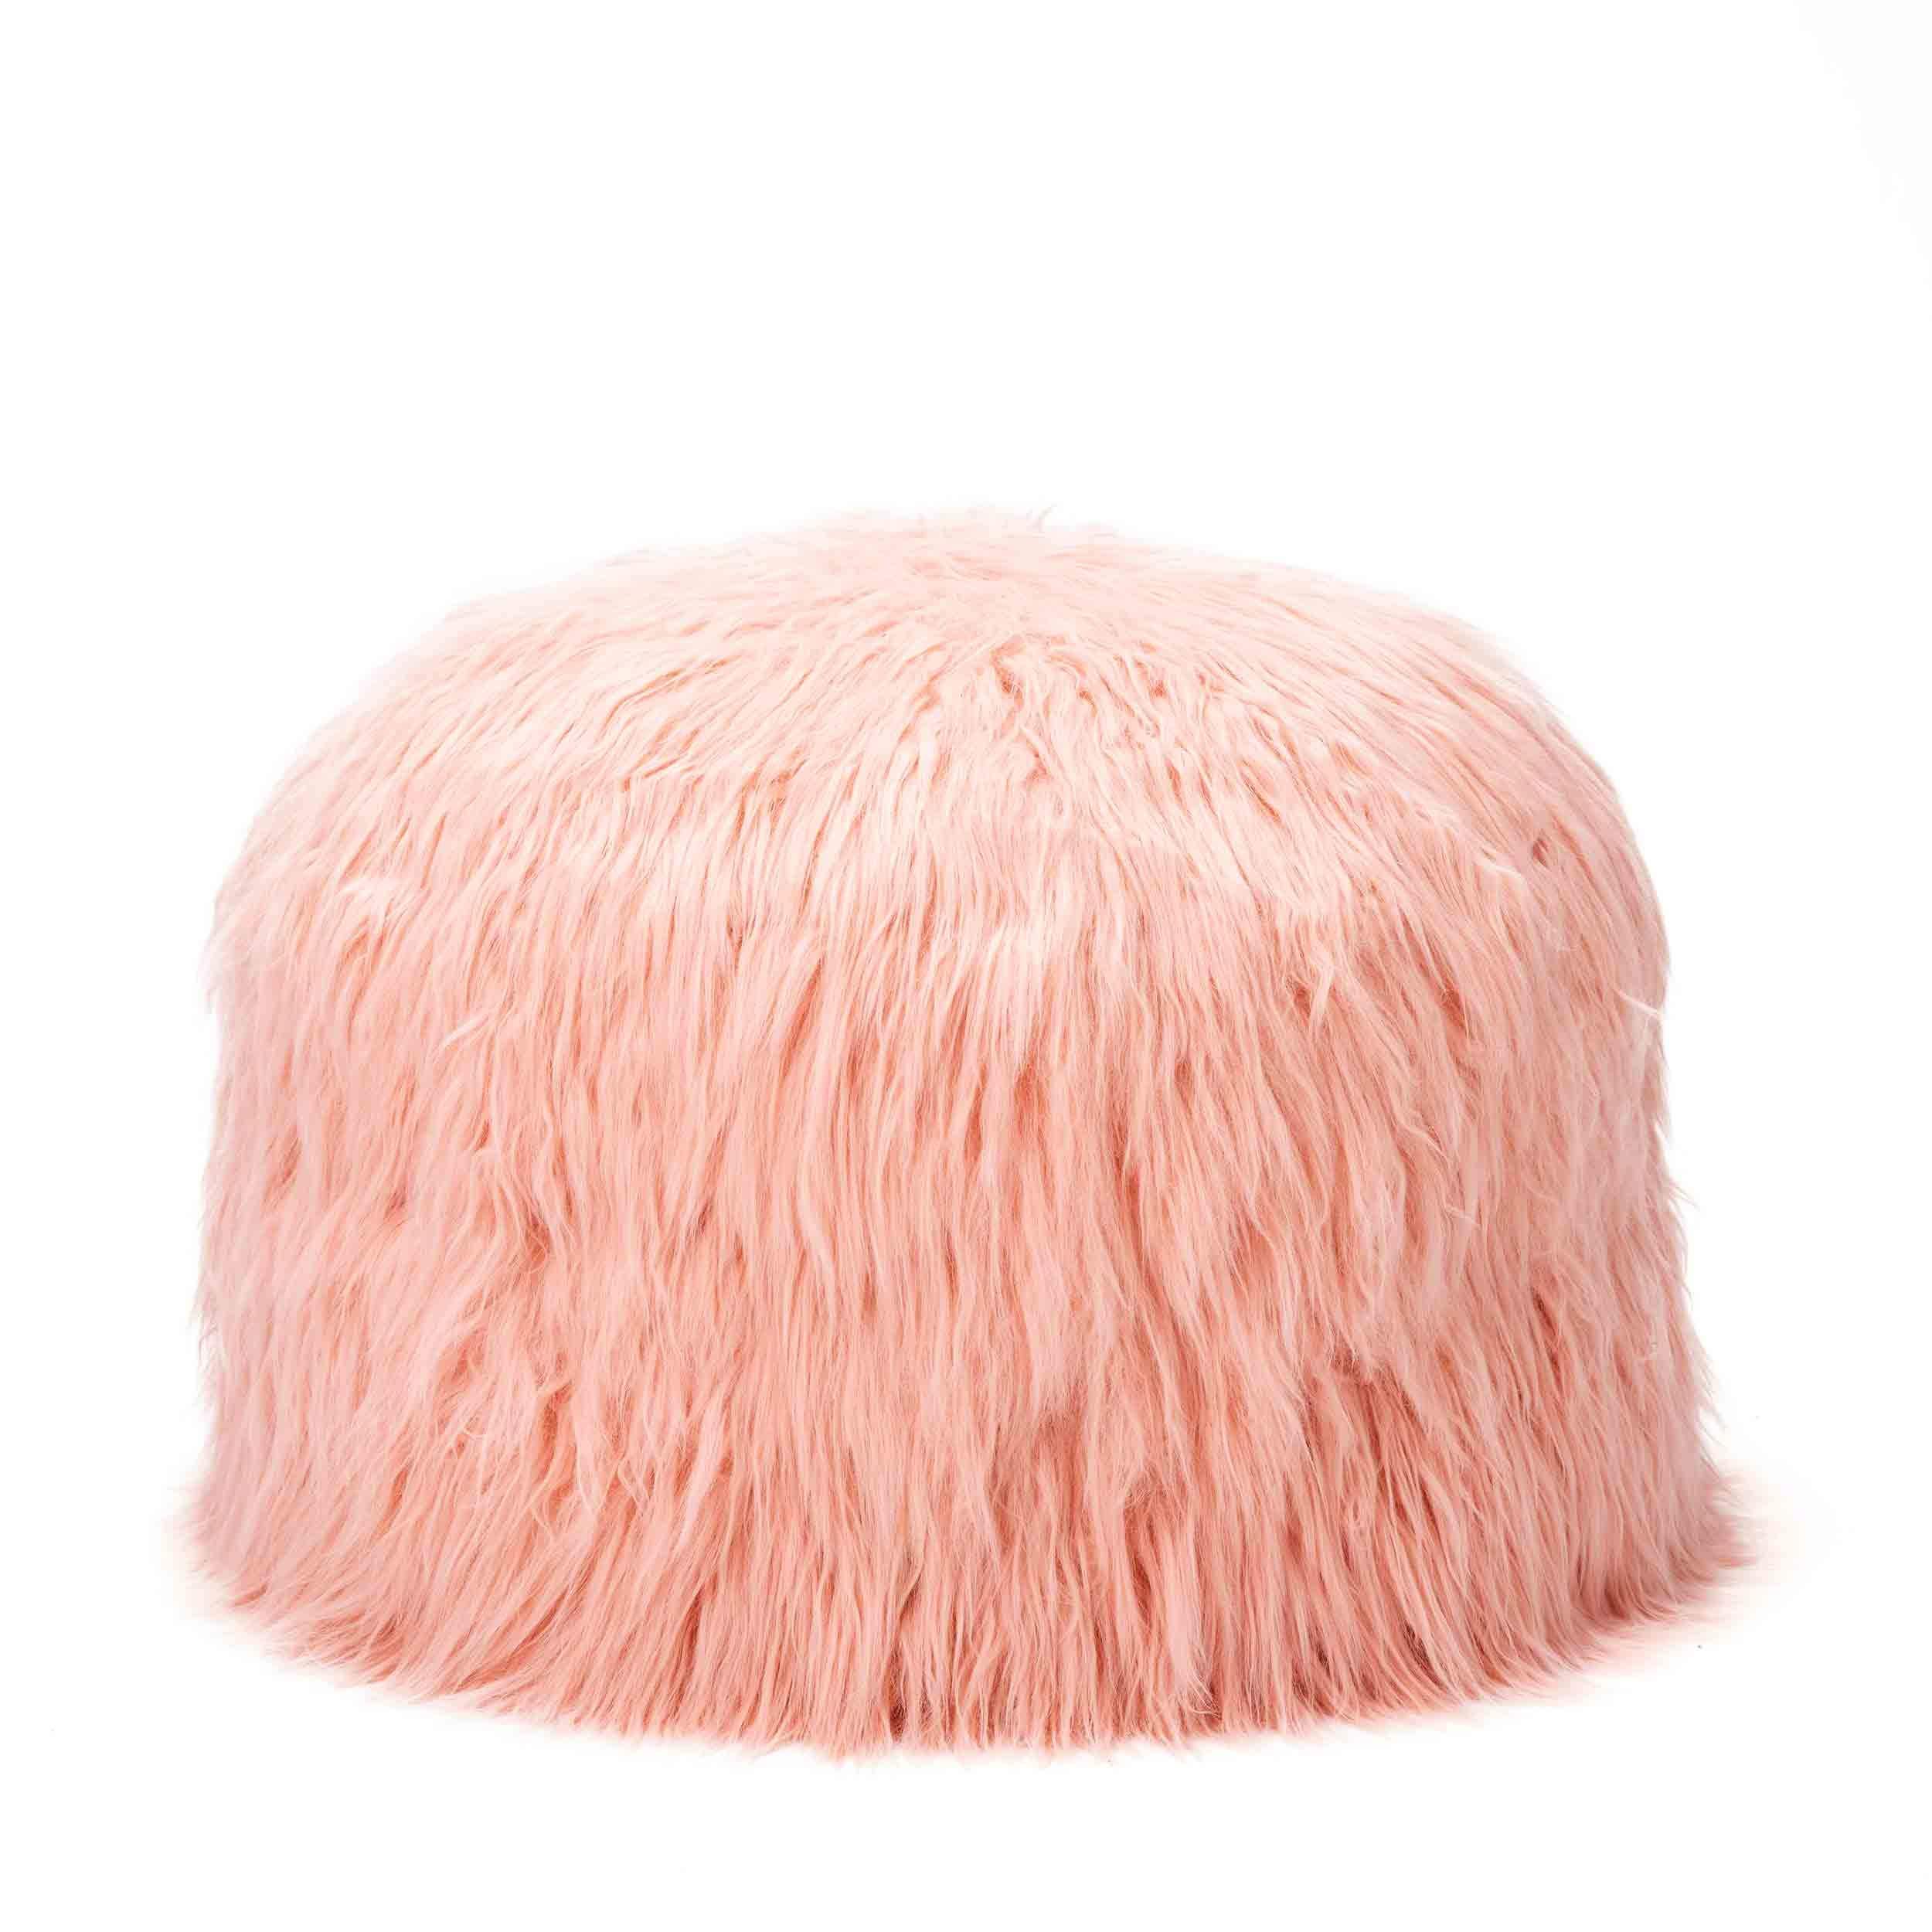 mimish Storage Pouf - Toy and Stuffed Animal Storage for Kids - Himalaya Faux Fur, Dusty Blush by mimish